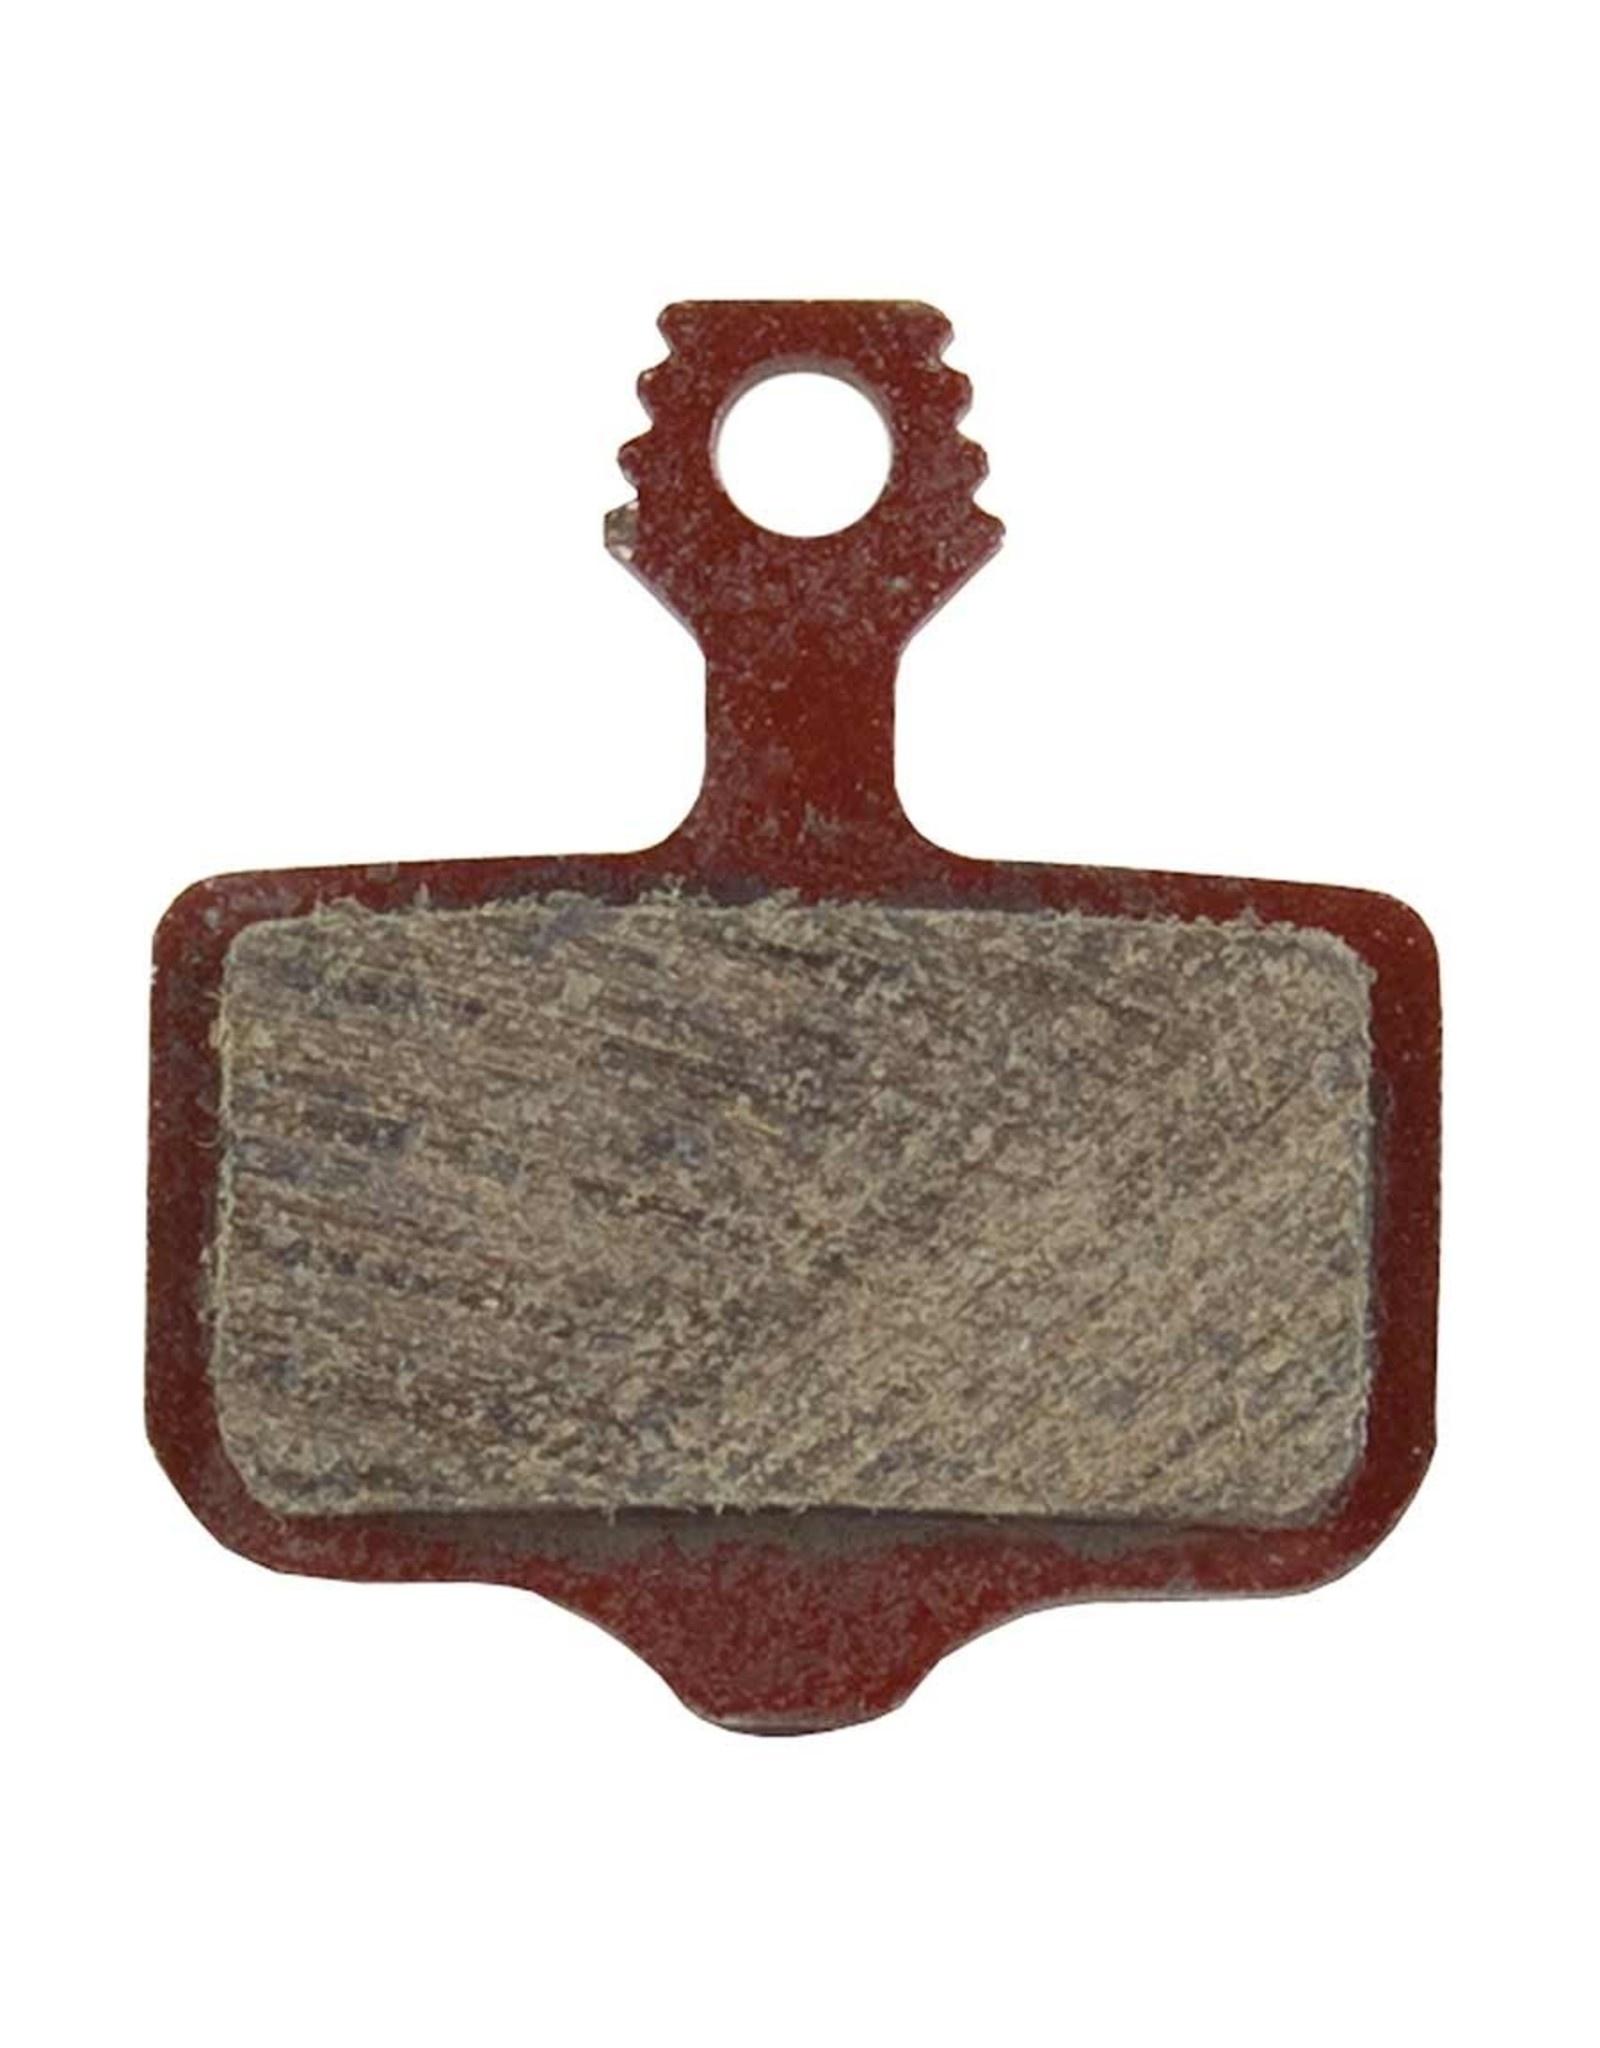 SRAM, 00.5315.035.020, Disc Brake Pads, Shape: Avid Elixir/SRAM Level/Force AXS HRD, Organic, Pair-1